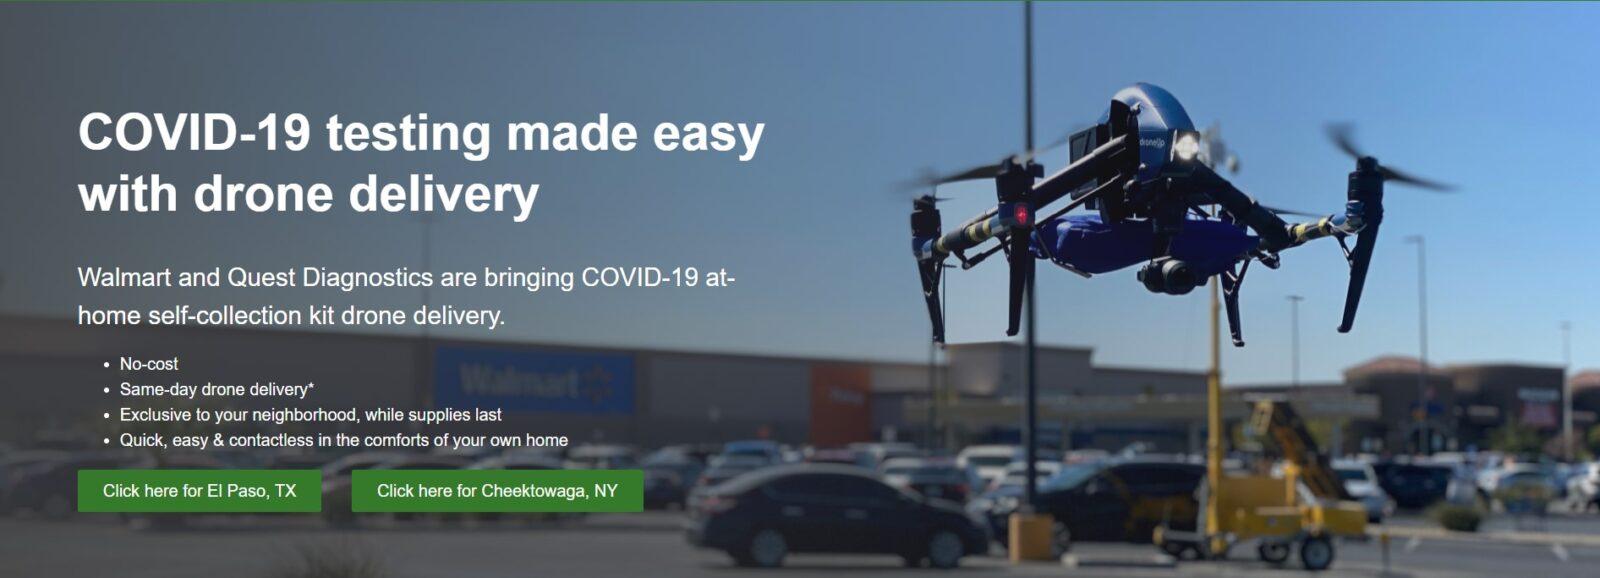 Дроны Walmart доставляют тесты на Covid-19.